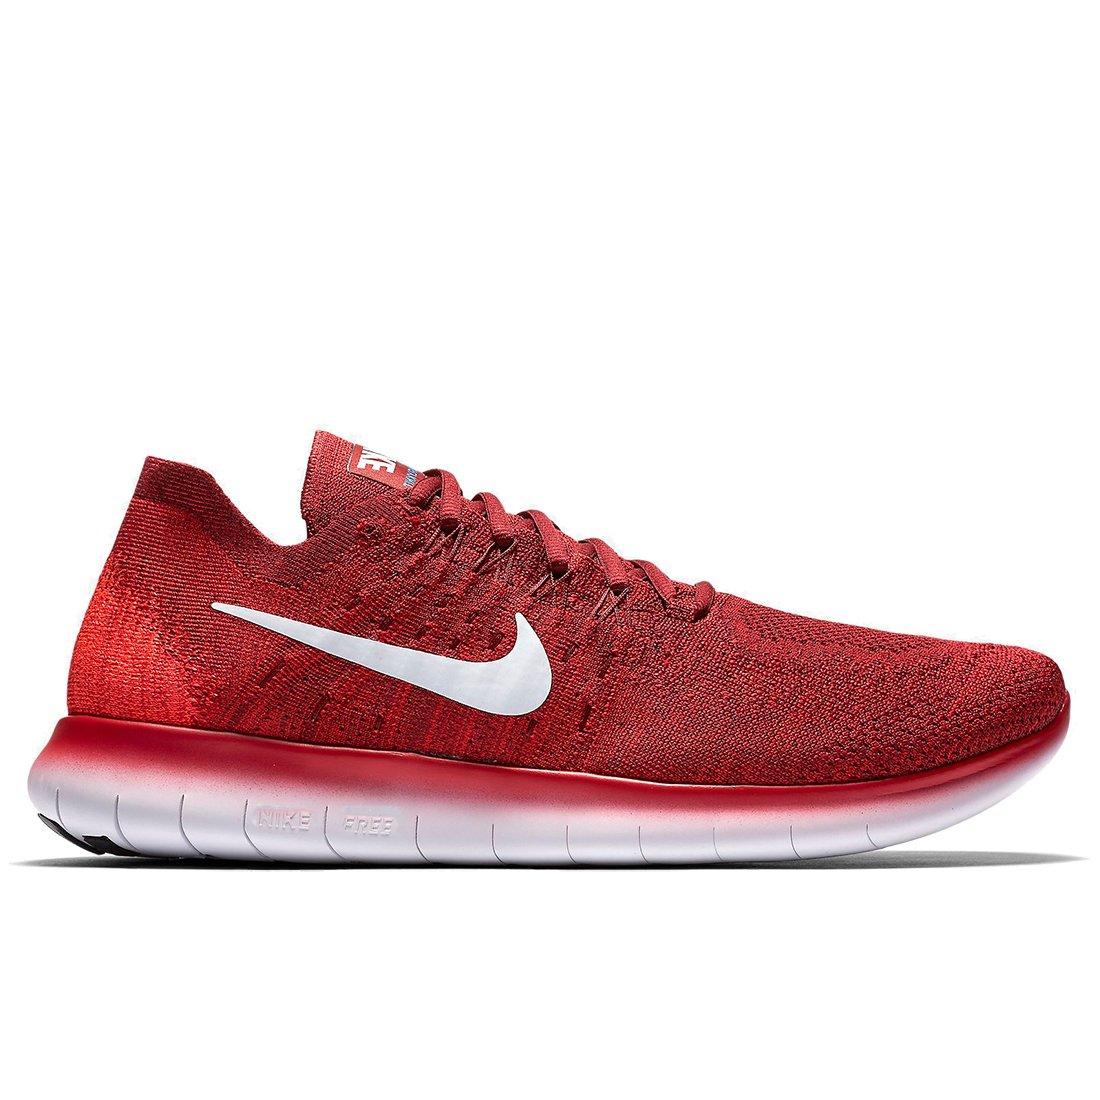 NIKE Men's Free RN Running Shoe B06XYPJ47T 12M (US)|Team Red/Pure Platinum